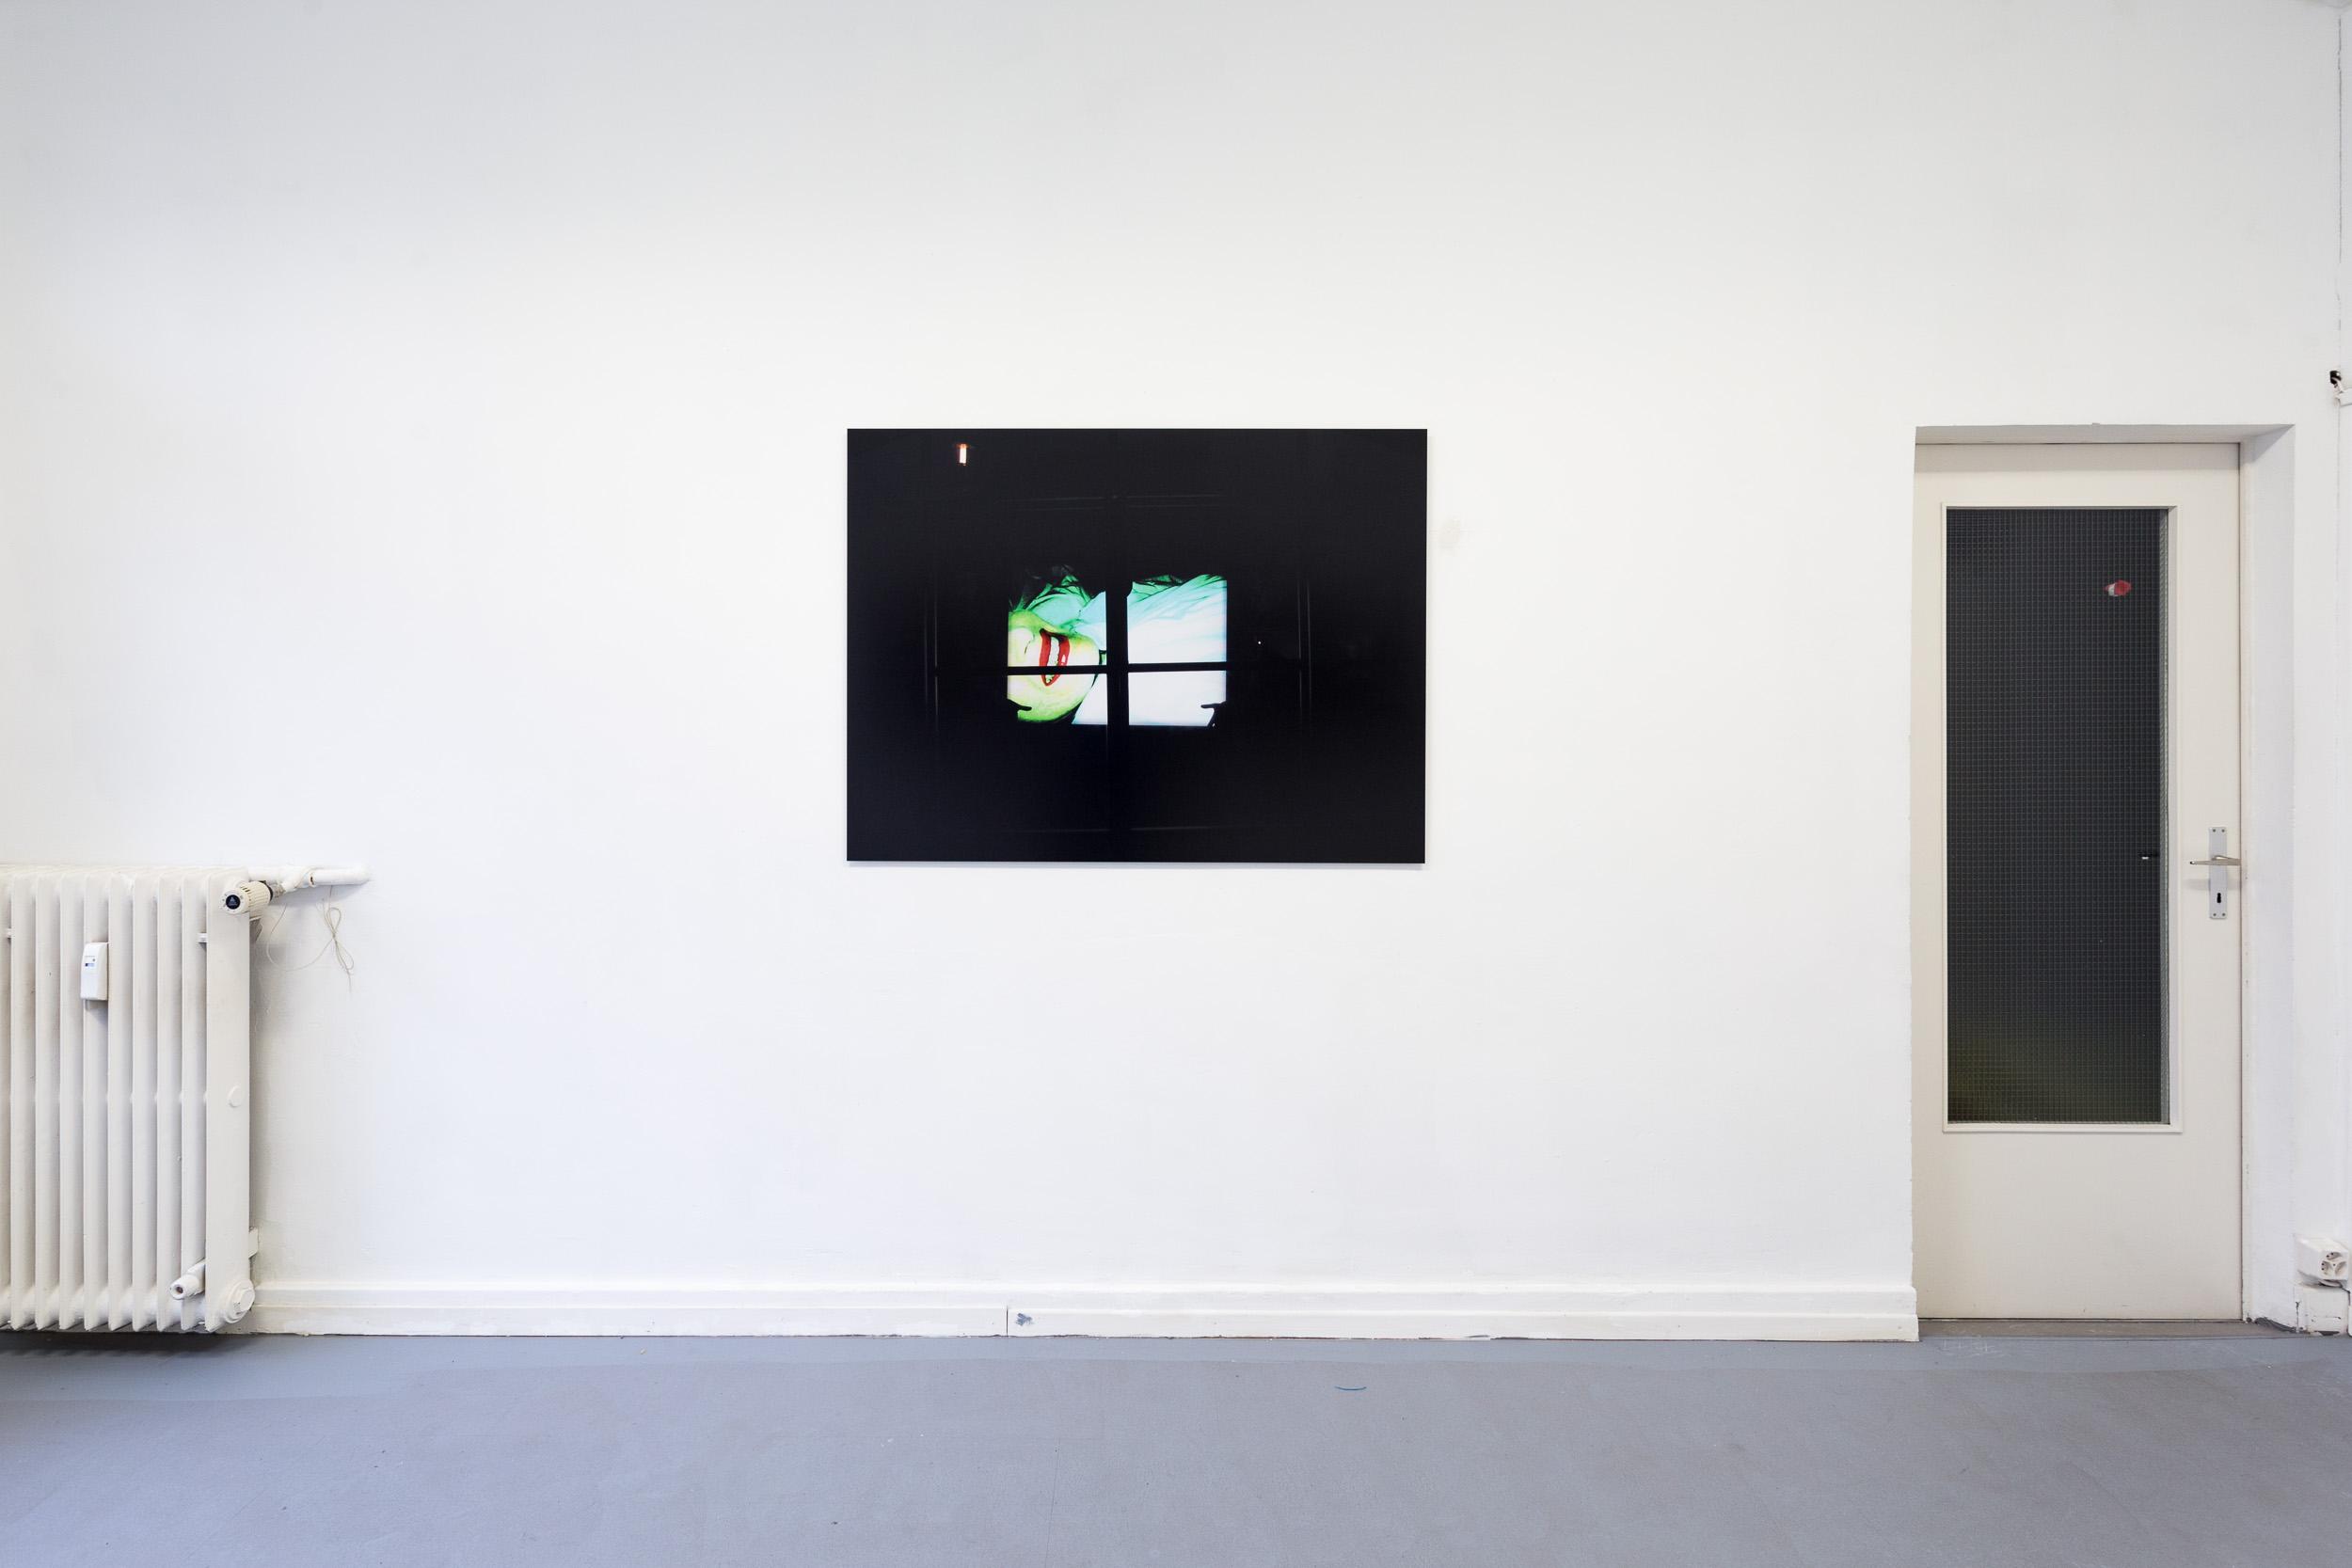 Manon,  Ohne Titel , 2017, C-Prints on Aluminium, 94 x 126cm  Photo: Kilian Bannwart